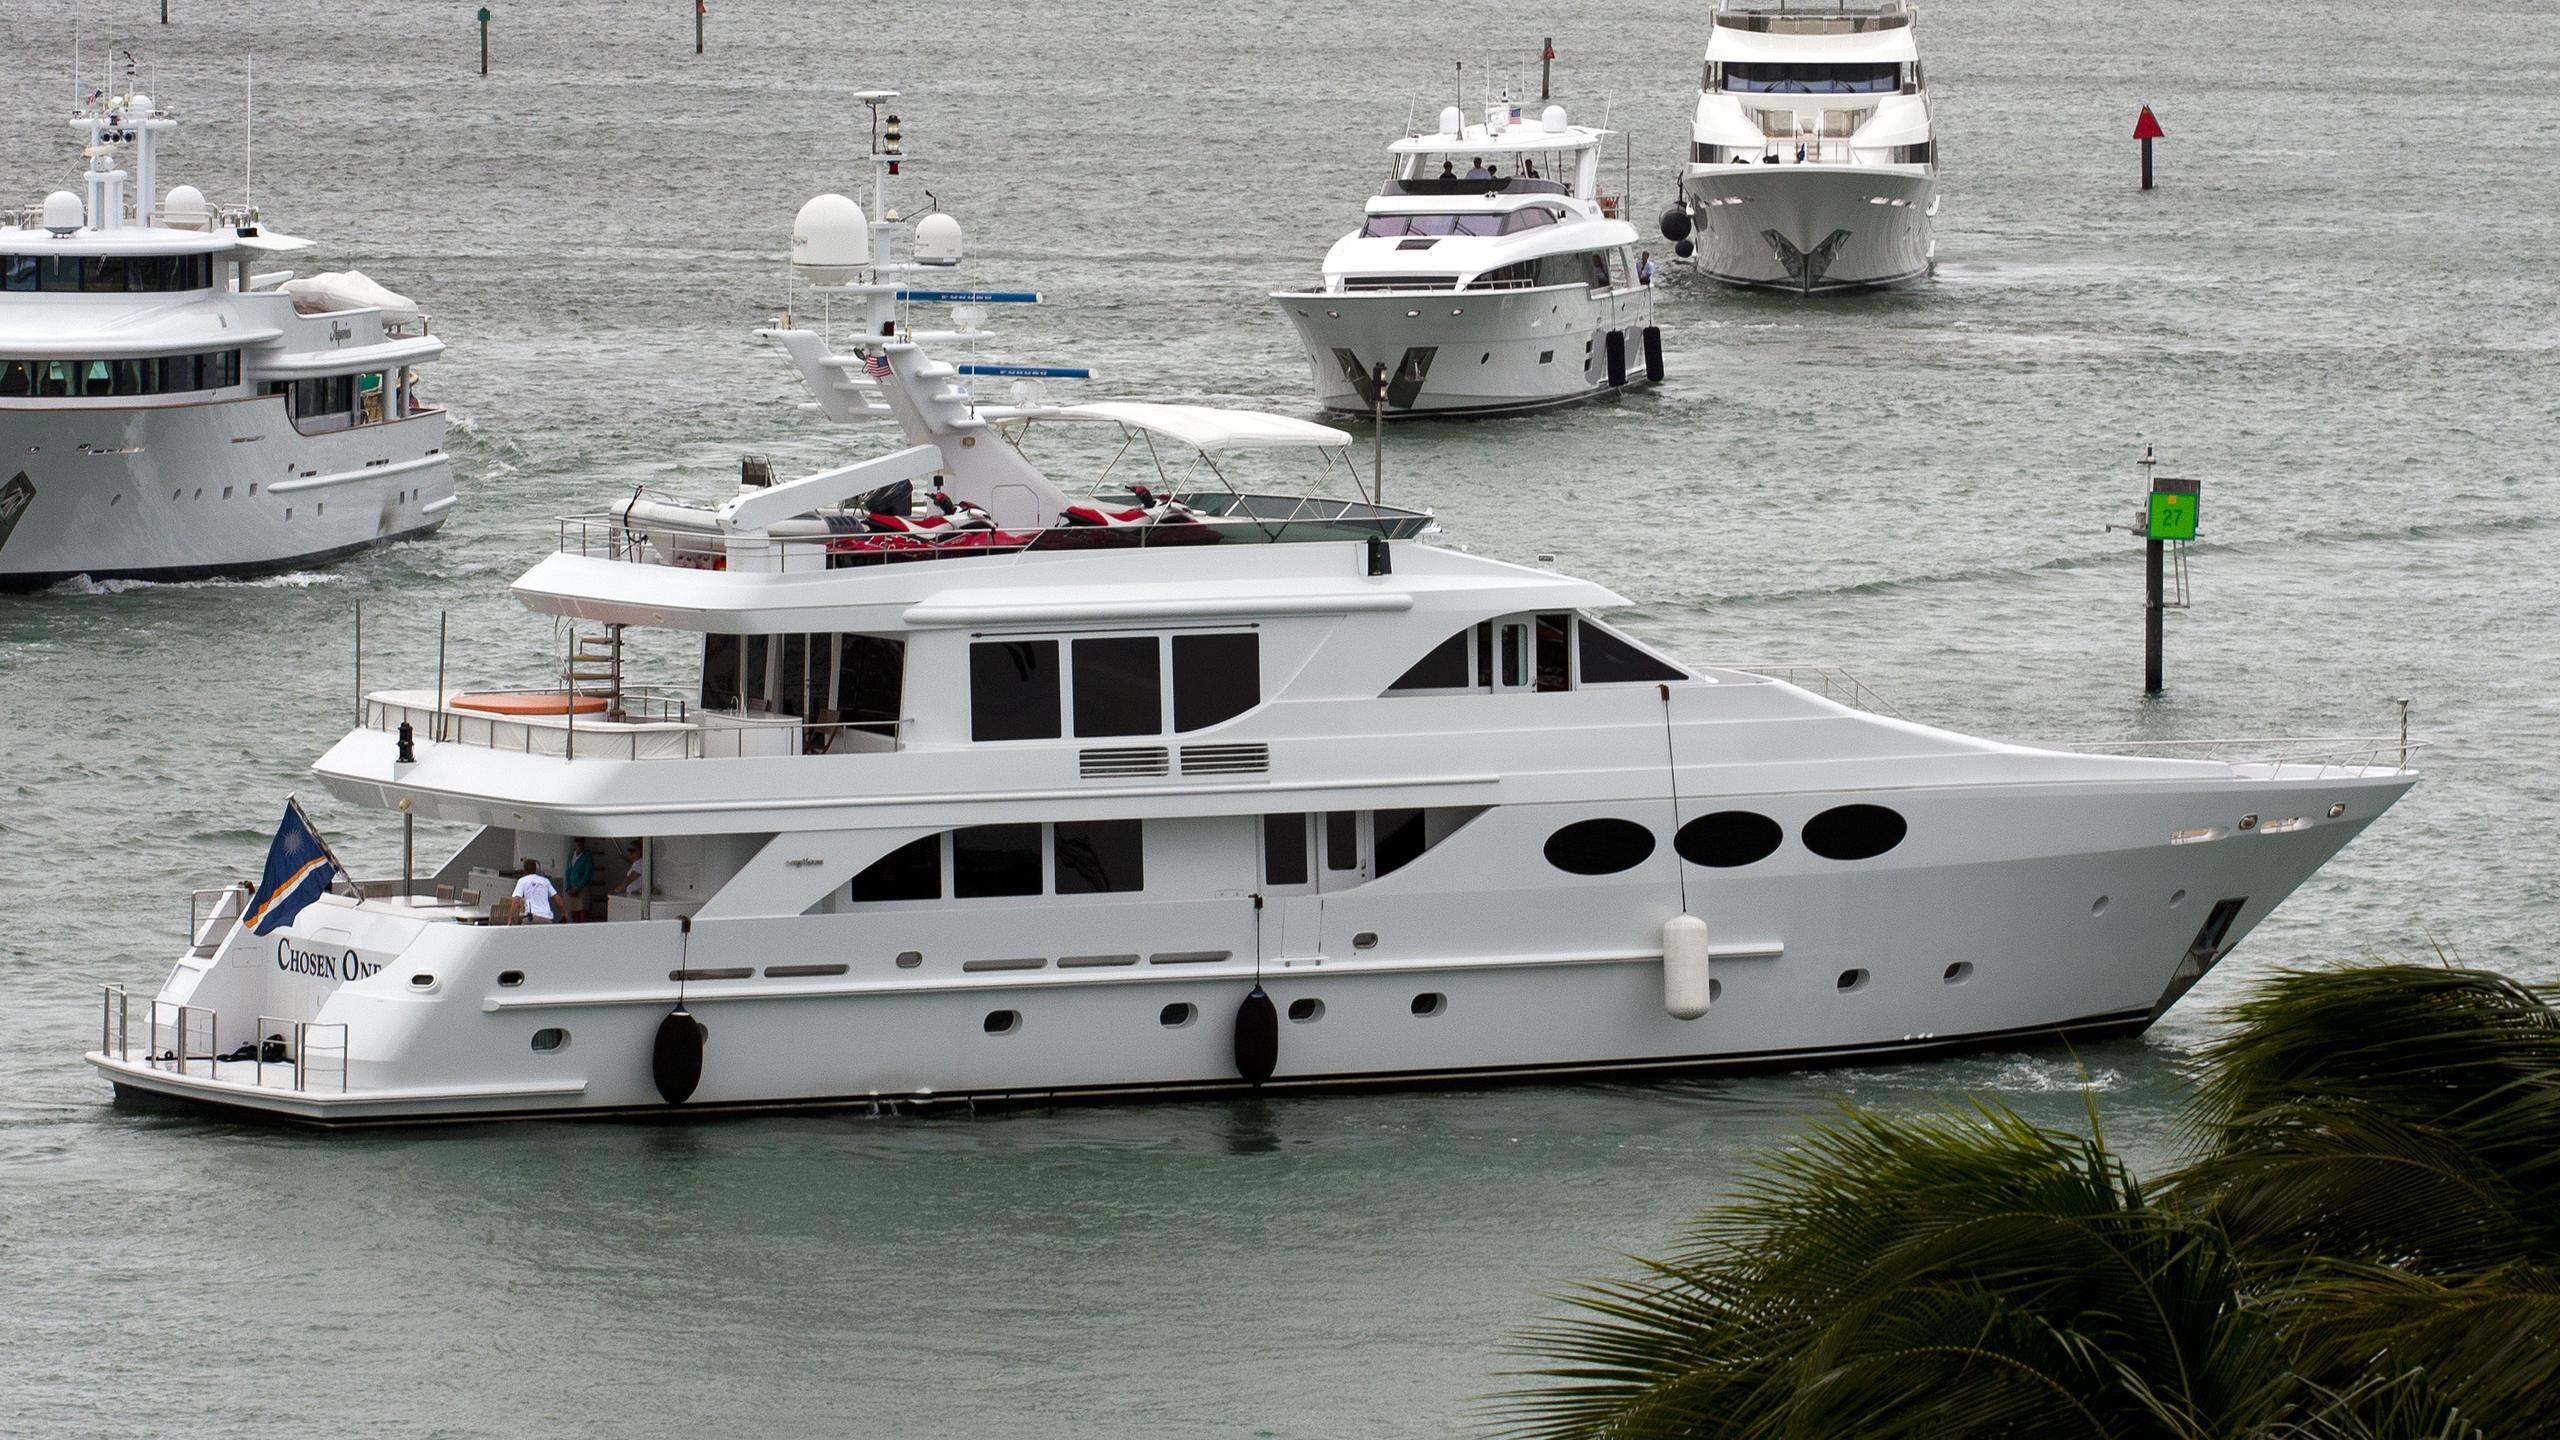 chosen-one-yacht-exterior